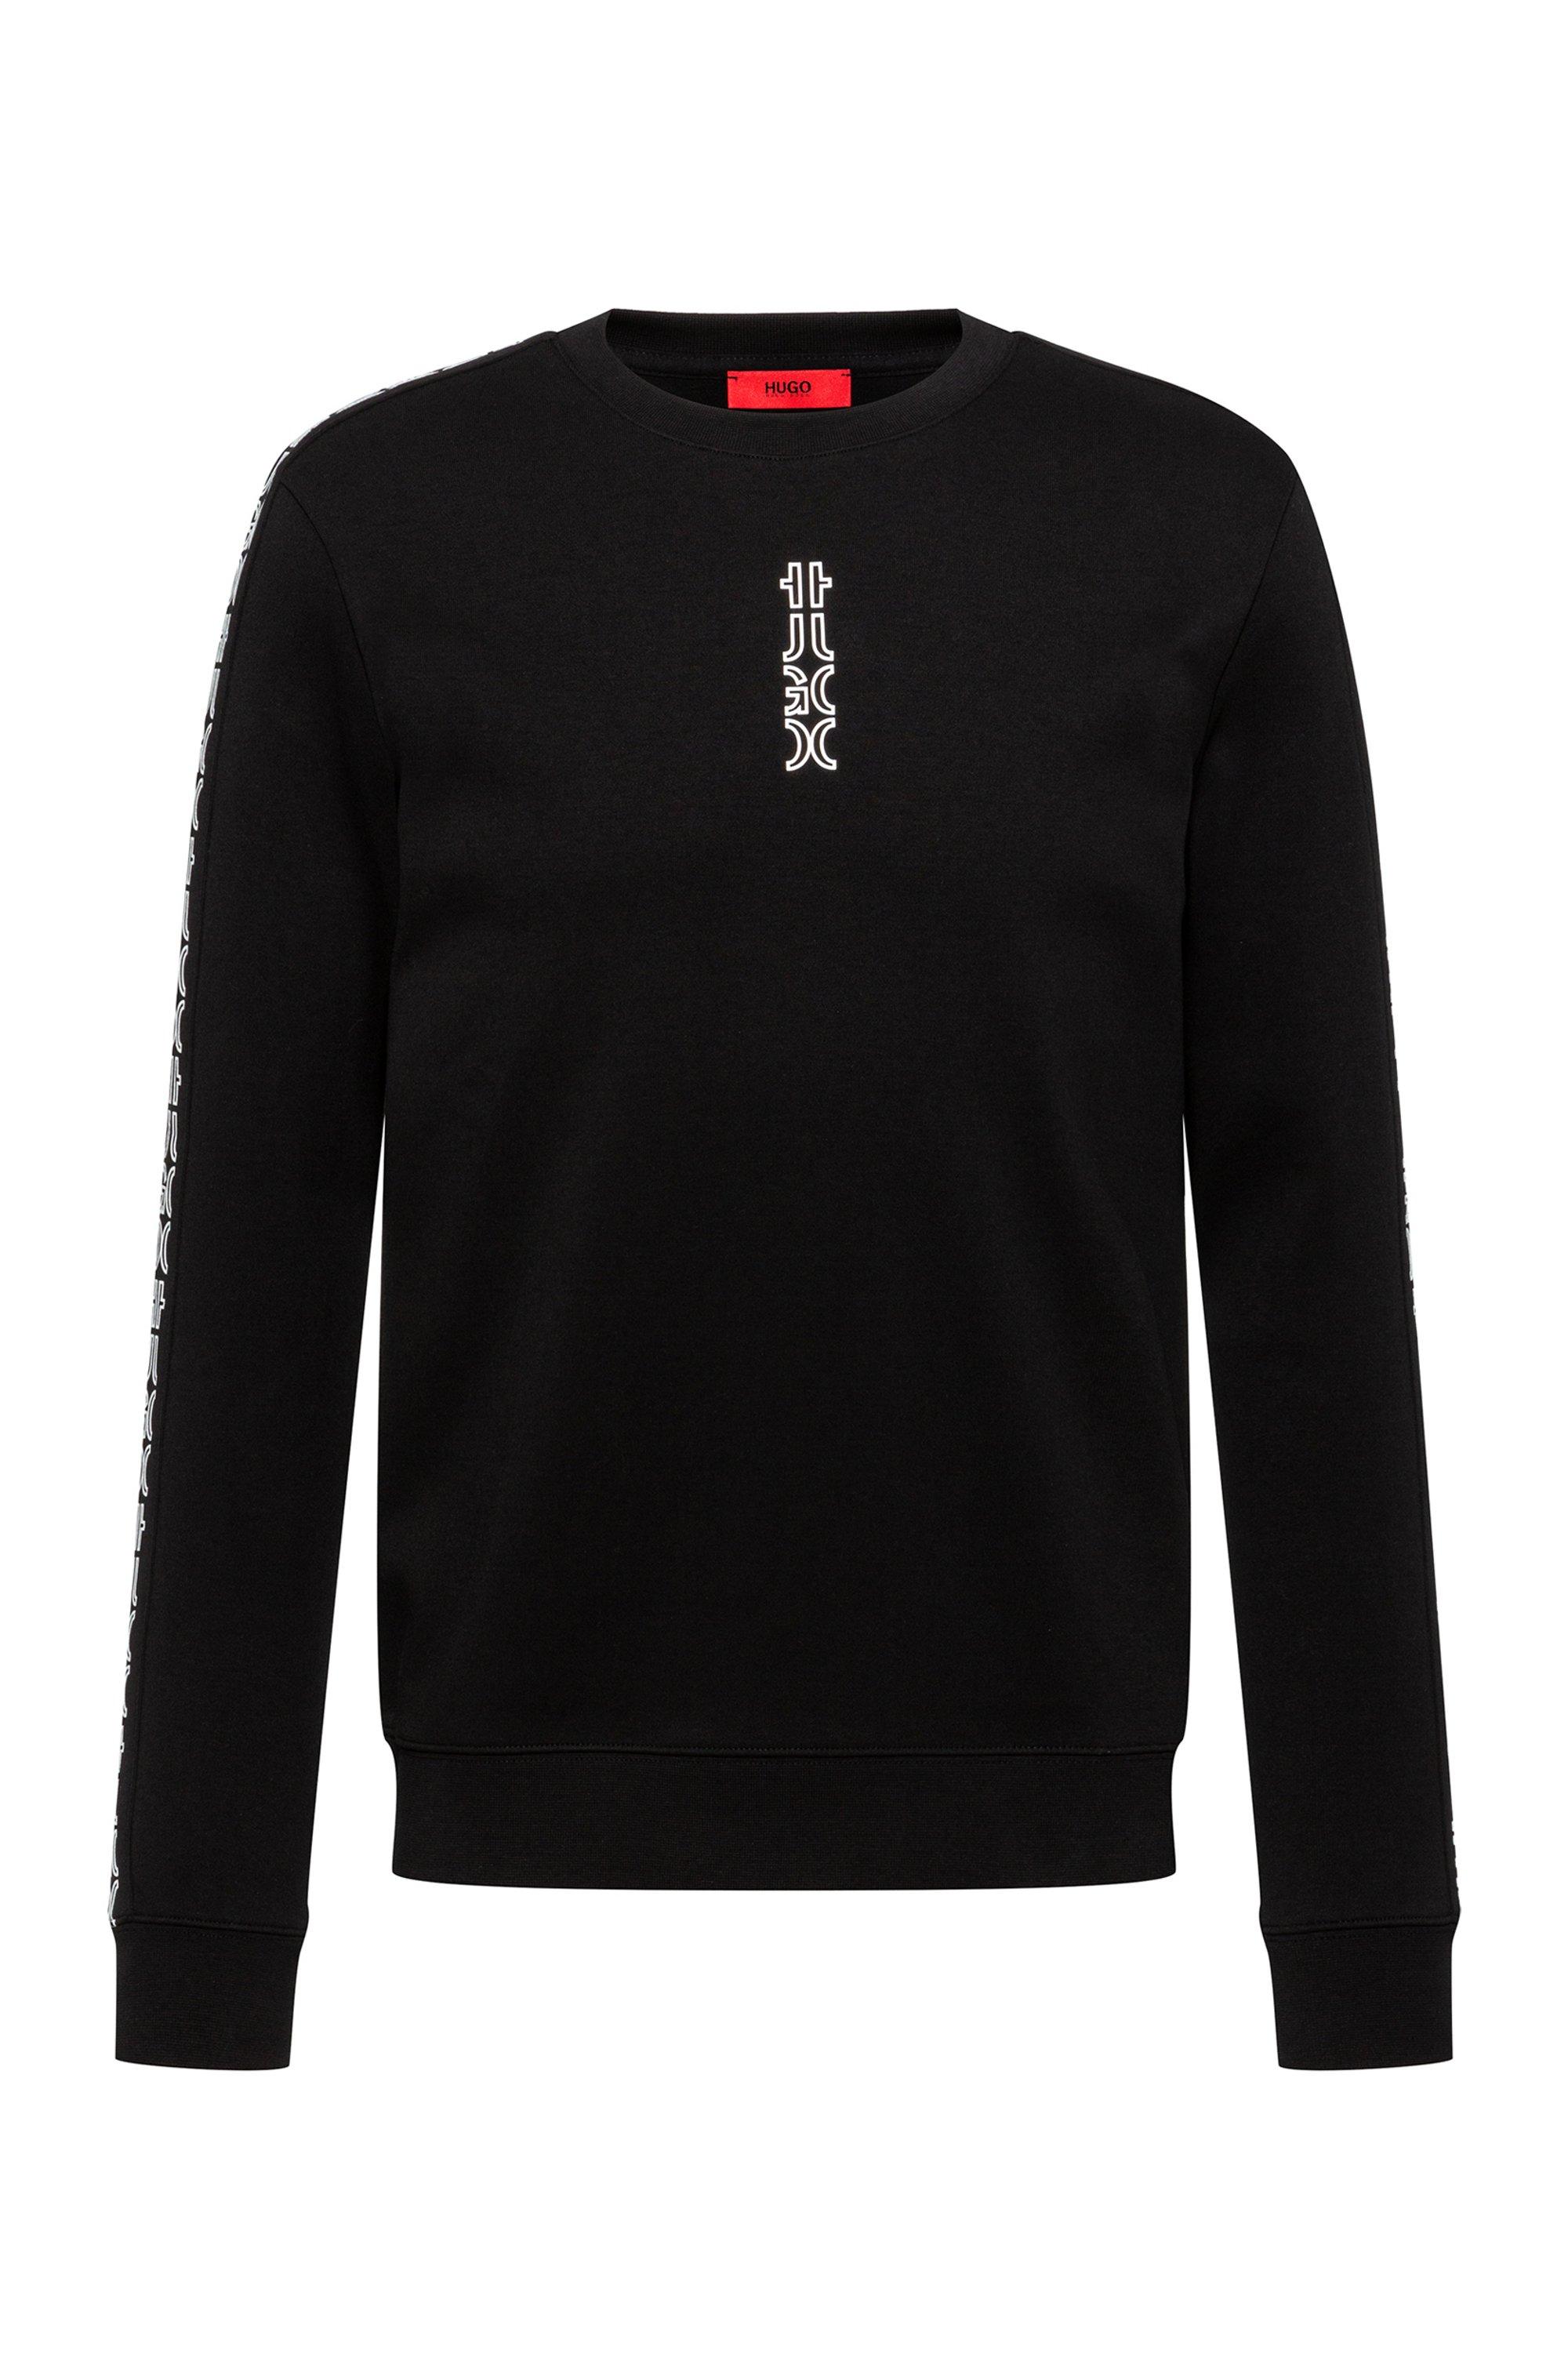 Crew-neck sweatshirt in organic cotton with cropped logos, Black